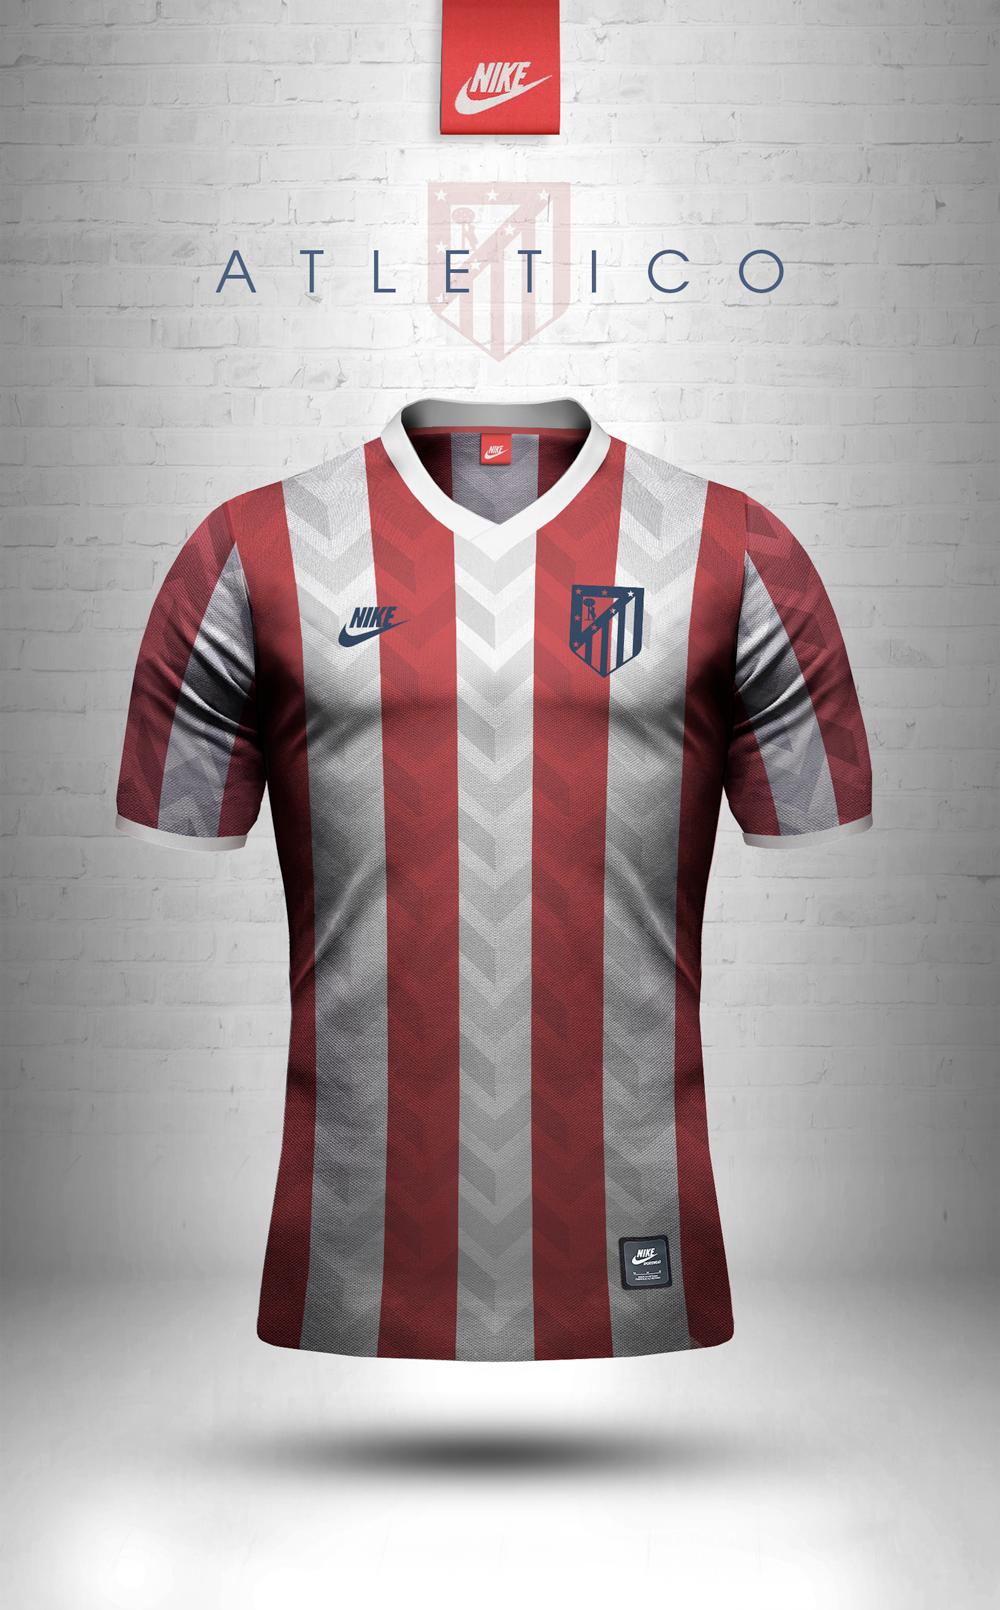 Maillot vintage Nike Atletico Madrid